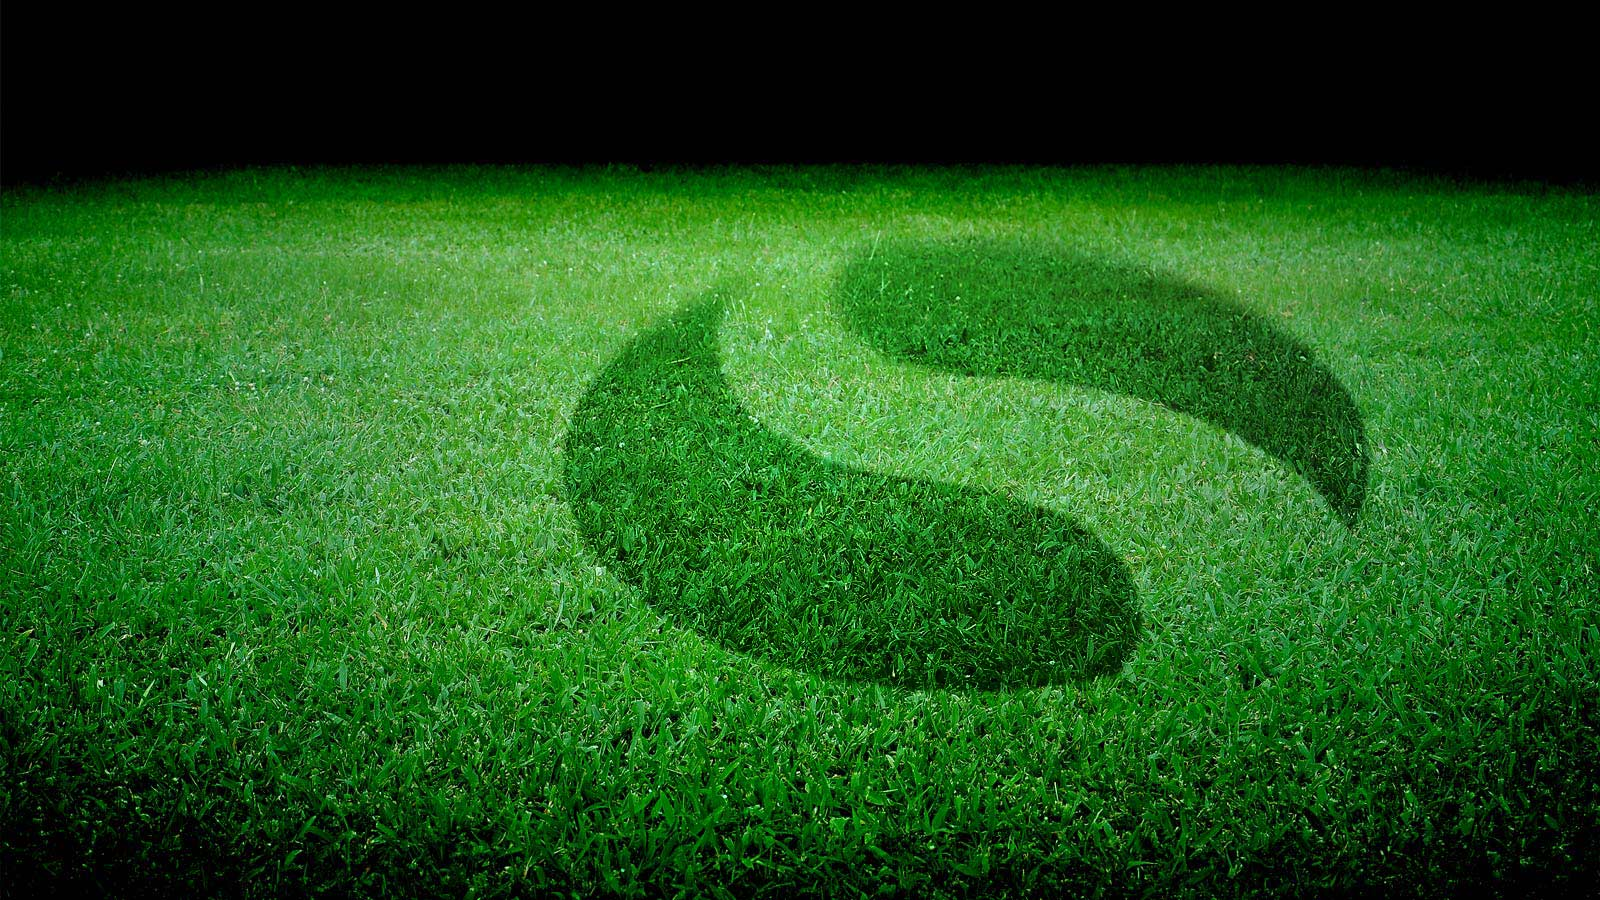 SubAir Logo in grass field